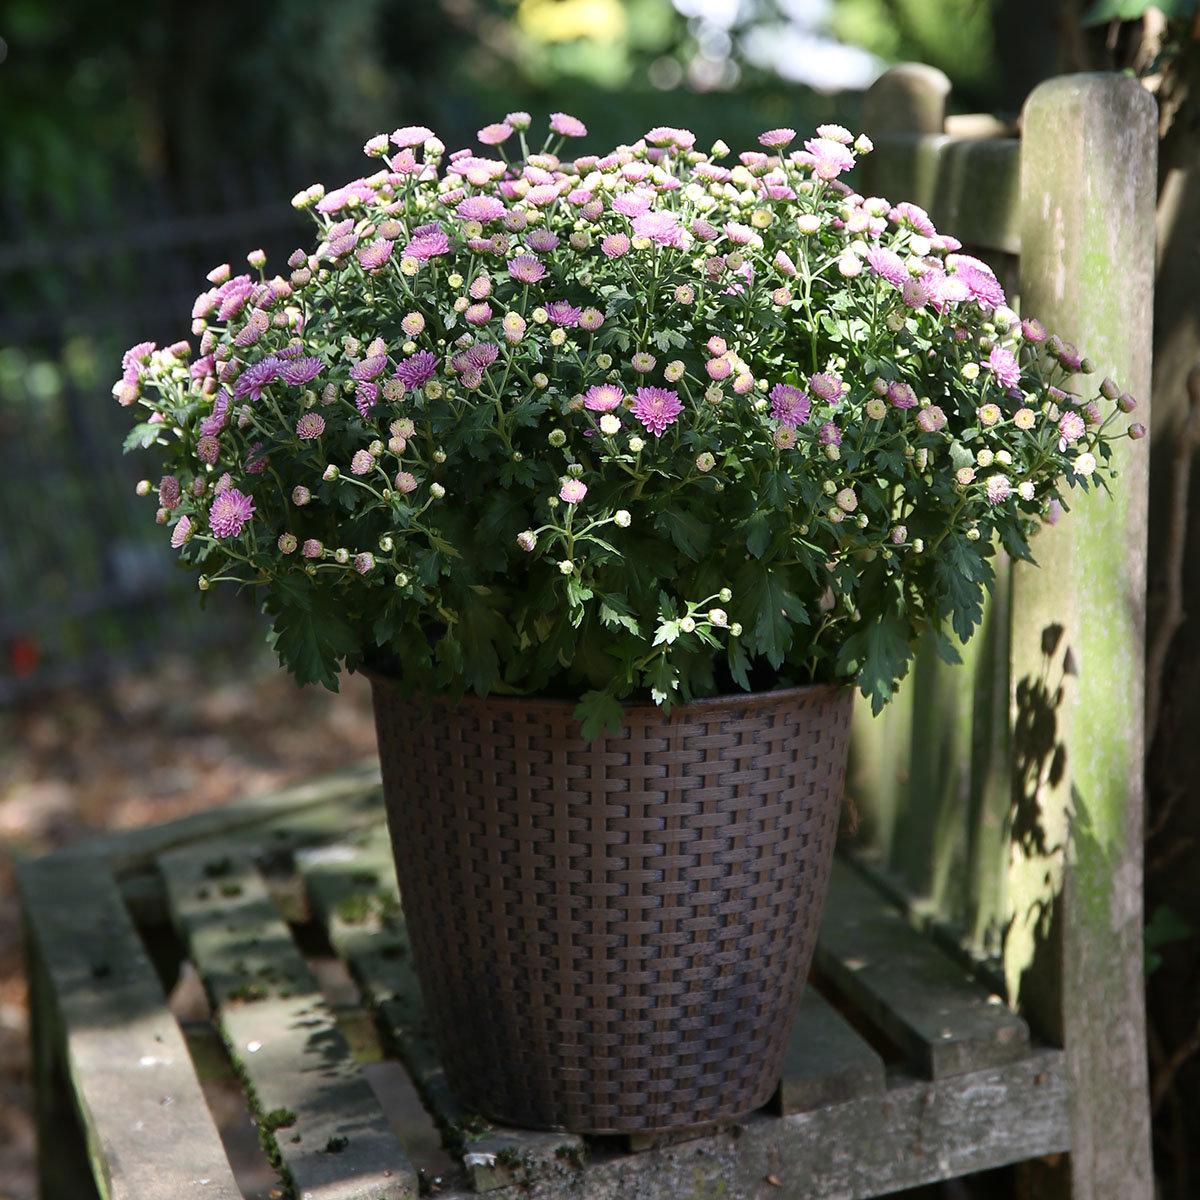 Herbst-Chrysantheme, Busch, violett